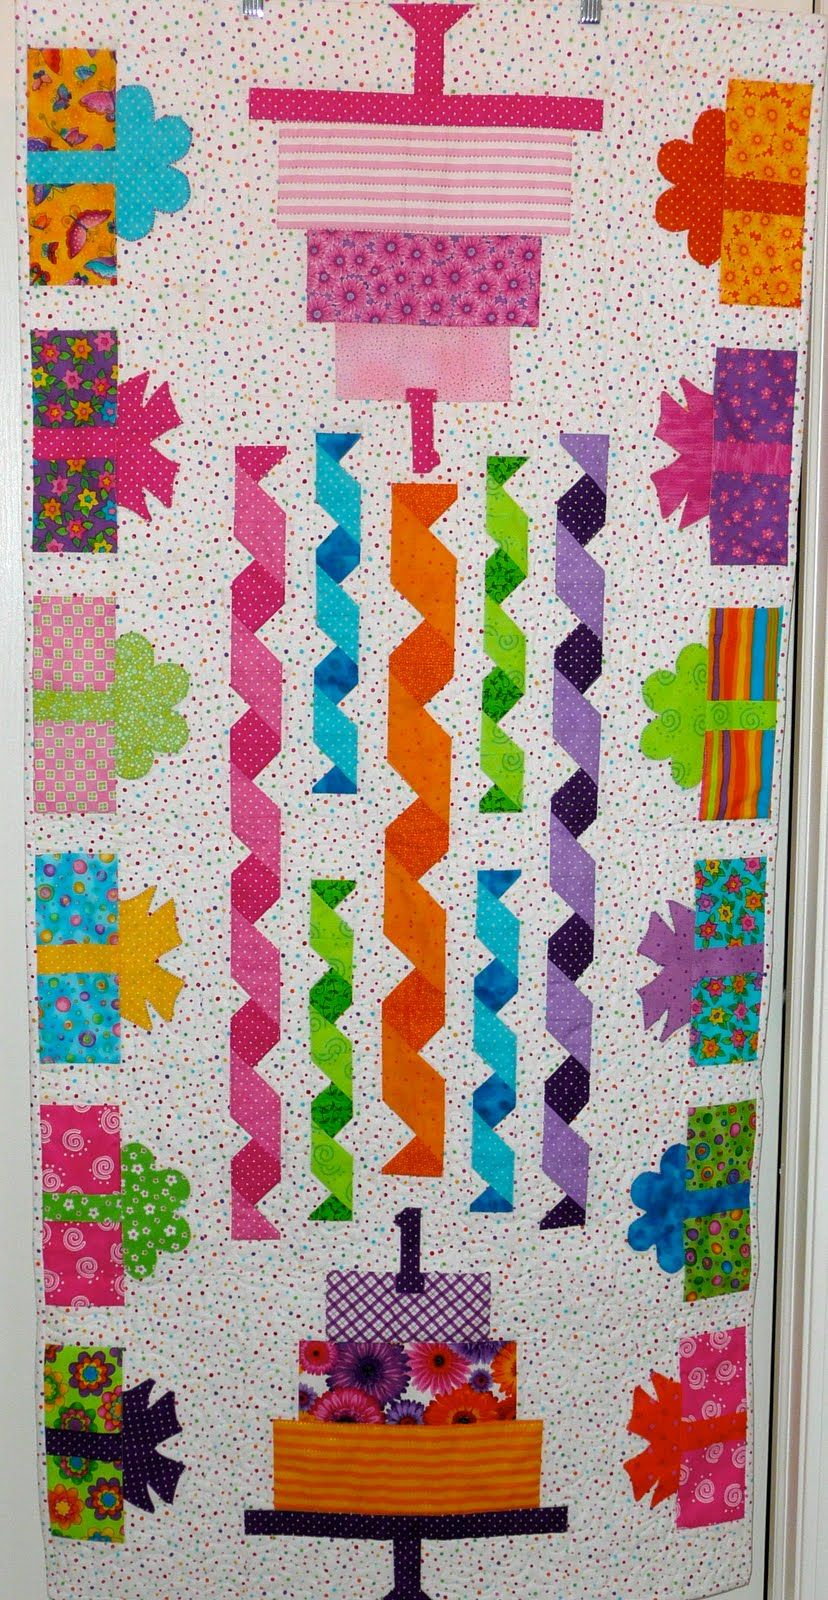 Hereus Block for the Jelly Roll Sampler Quilt Along sponsored by